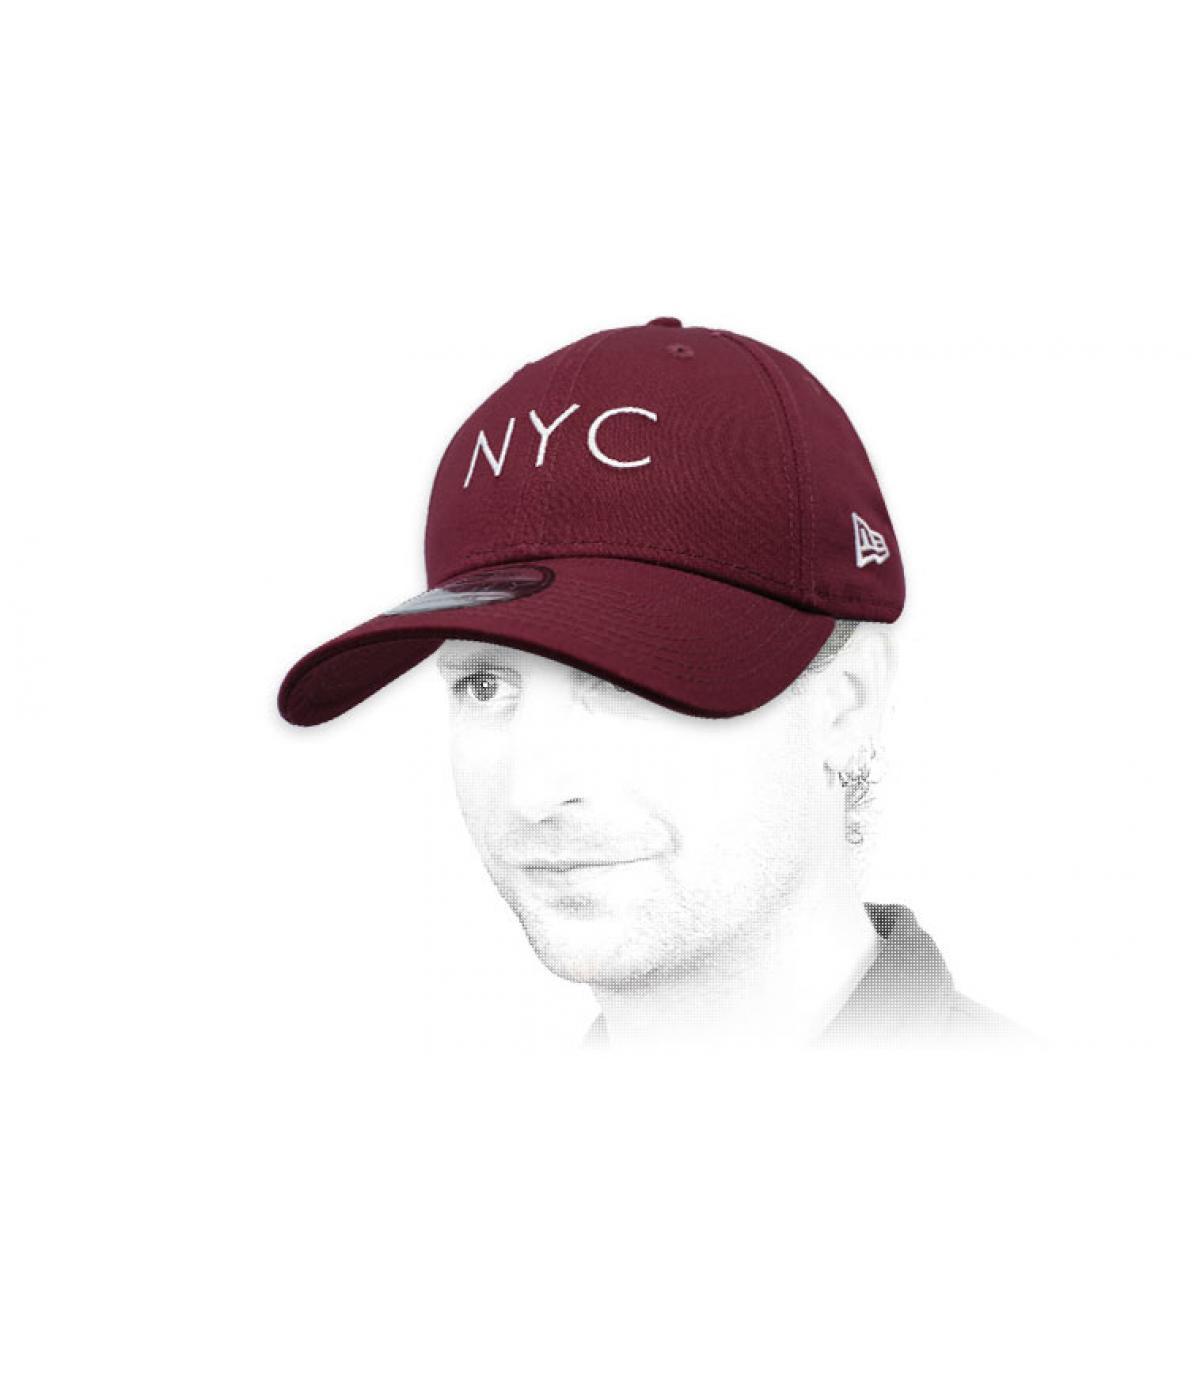 burgundy NYC cap